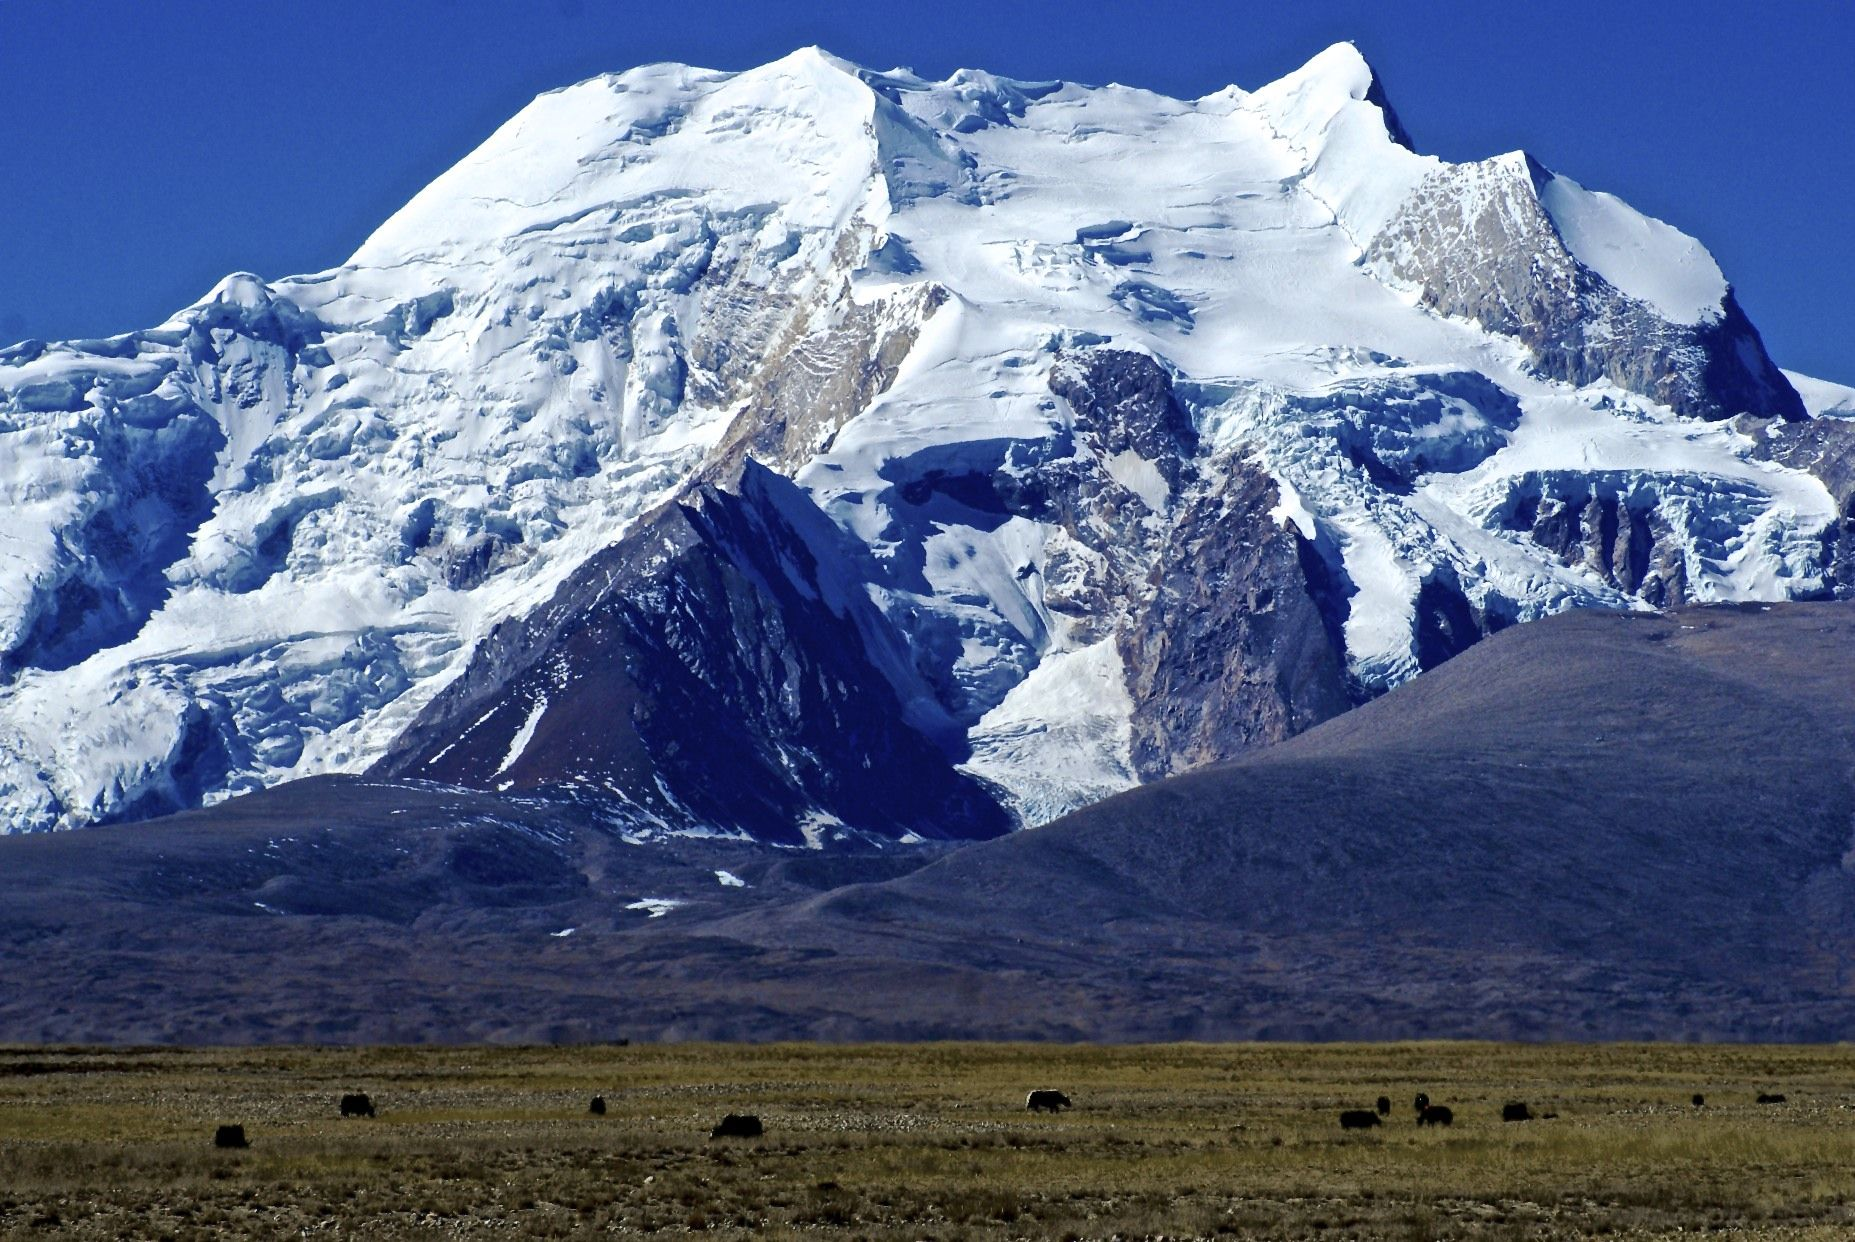 himalayas mountain range - Khafre